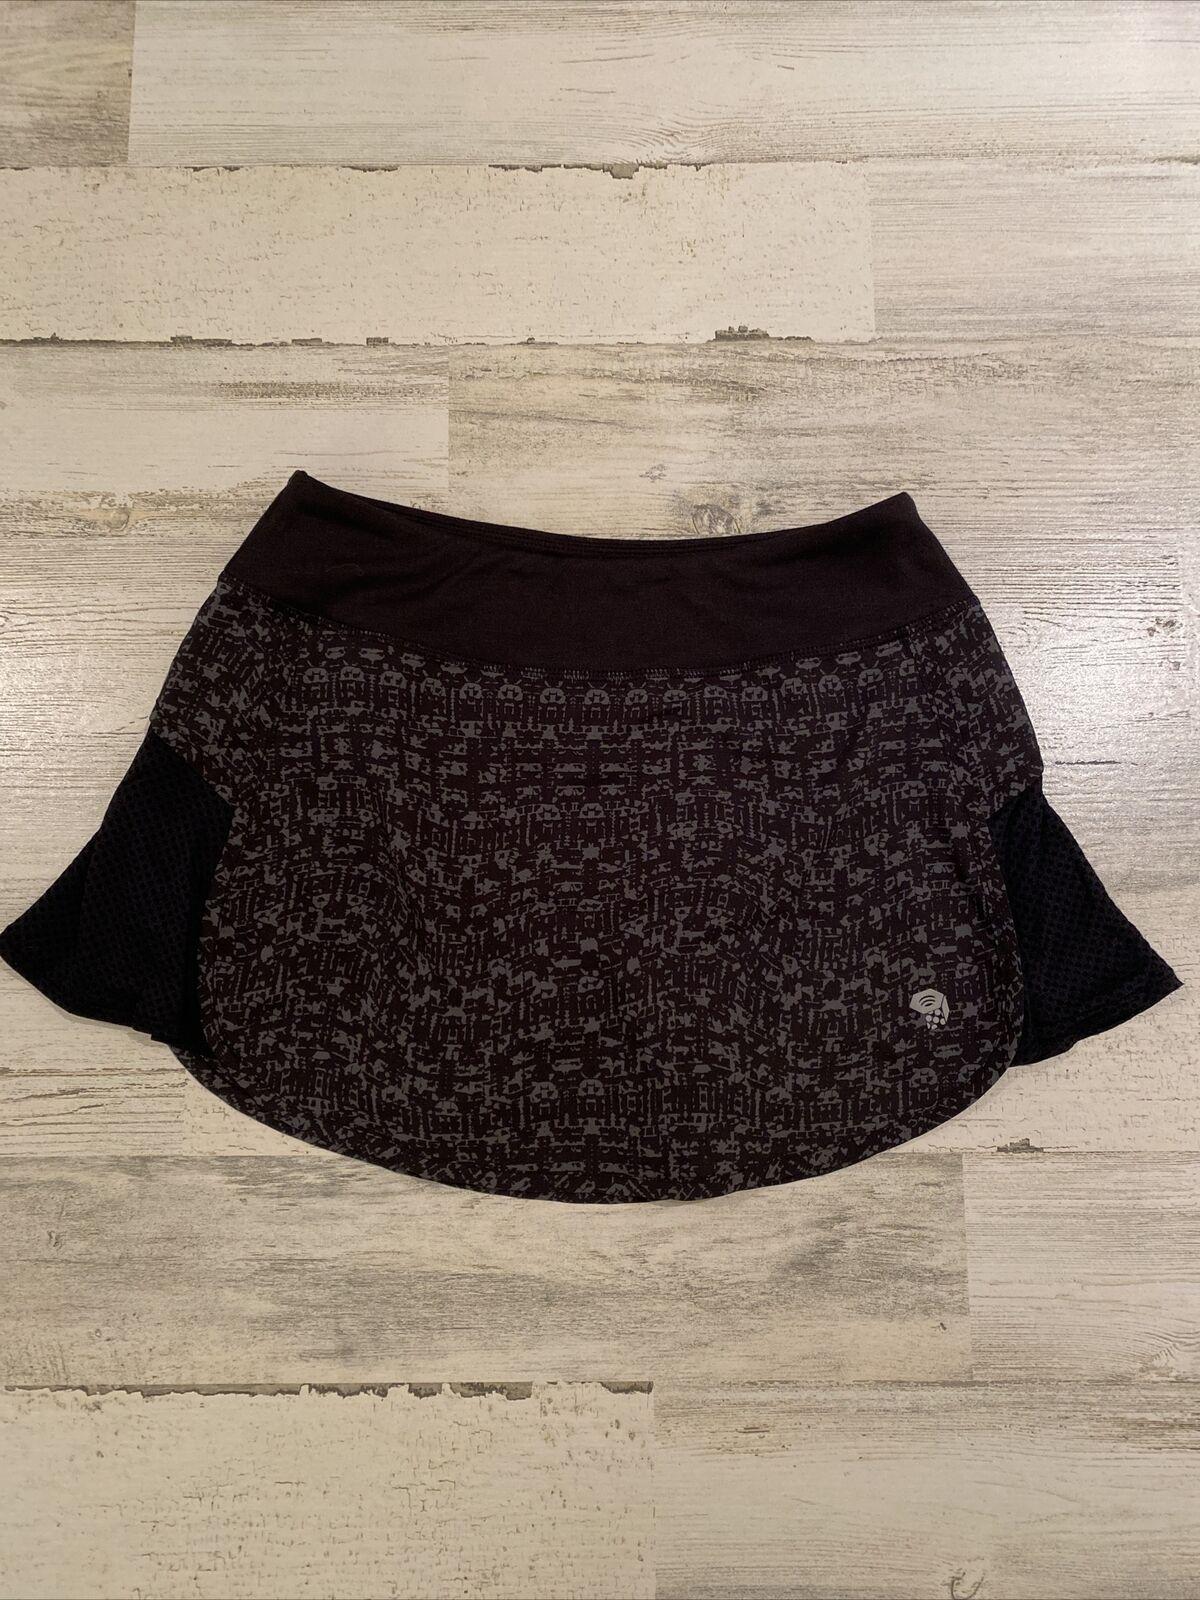 Mountain Hardwear Women's Sz S Black Gray Tennis Outdoor Hiking Skirt Skort